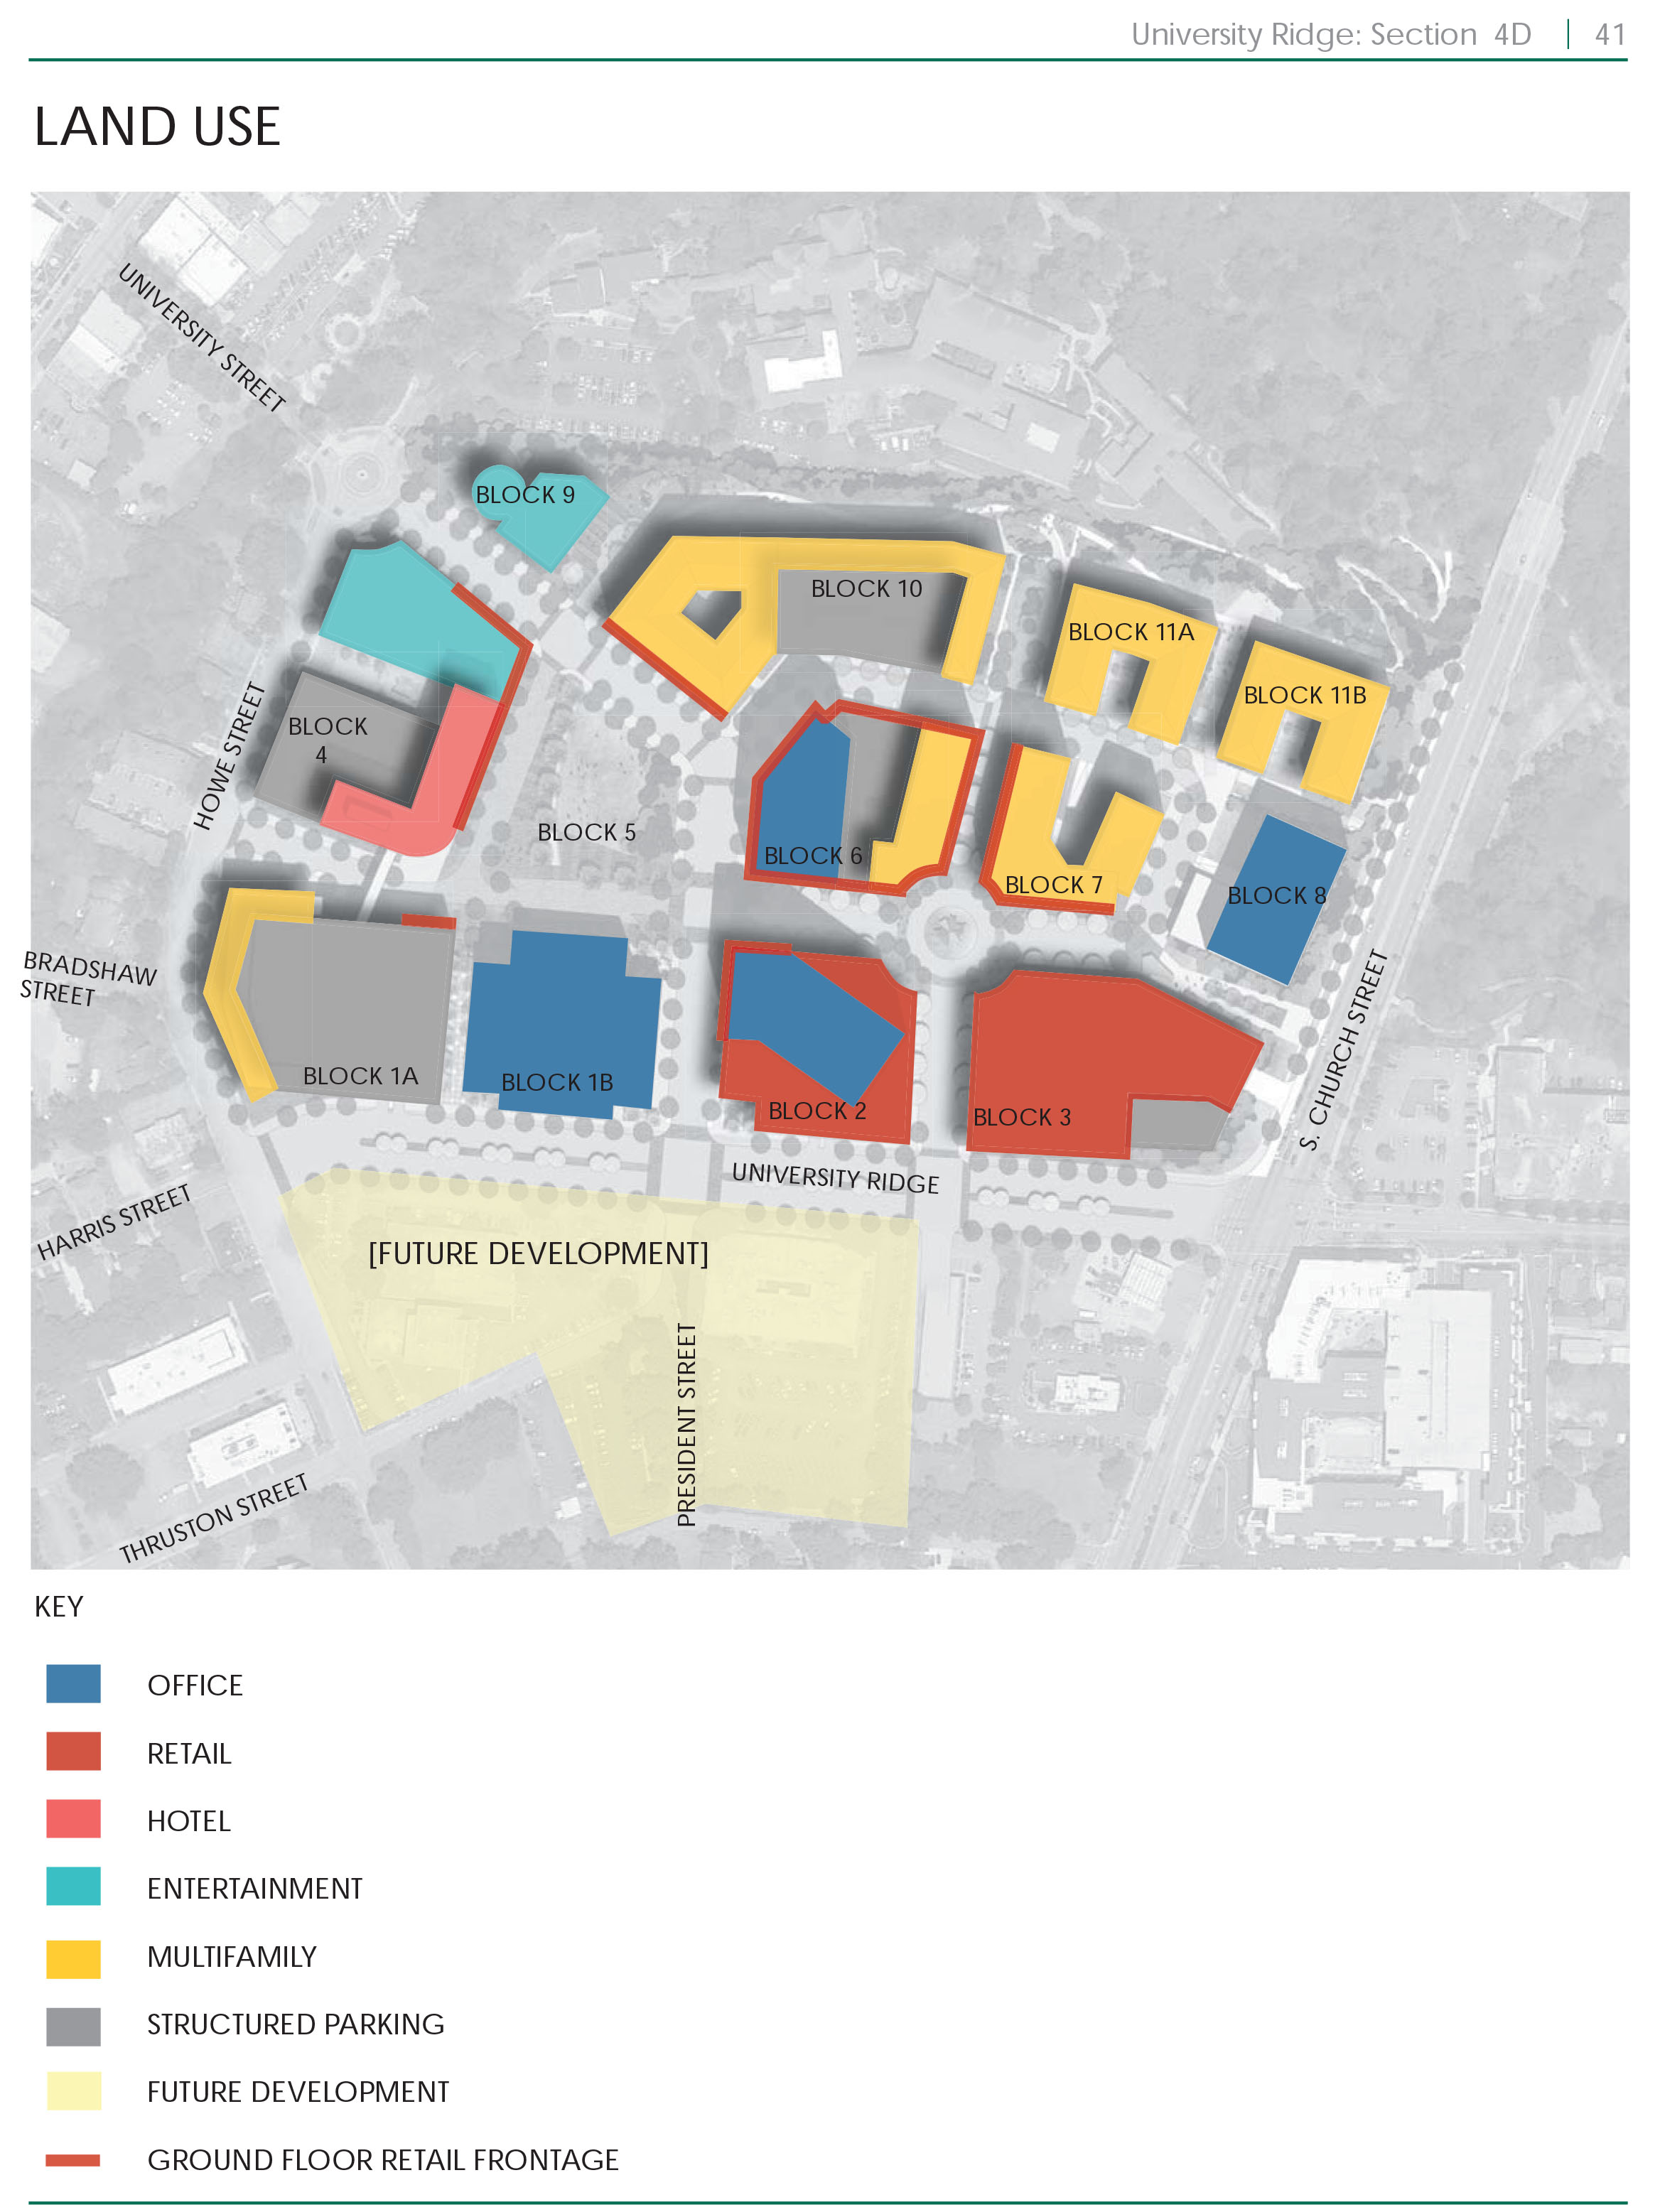 University Ridge-Greenville-SC-RFP-Armada Hoffler Properties-CitiSculpt-3.jpg